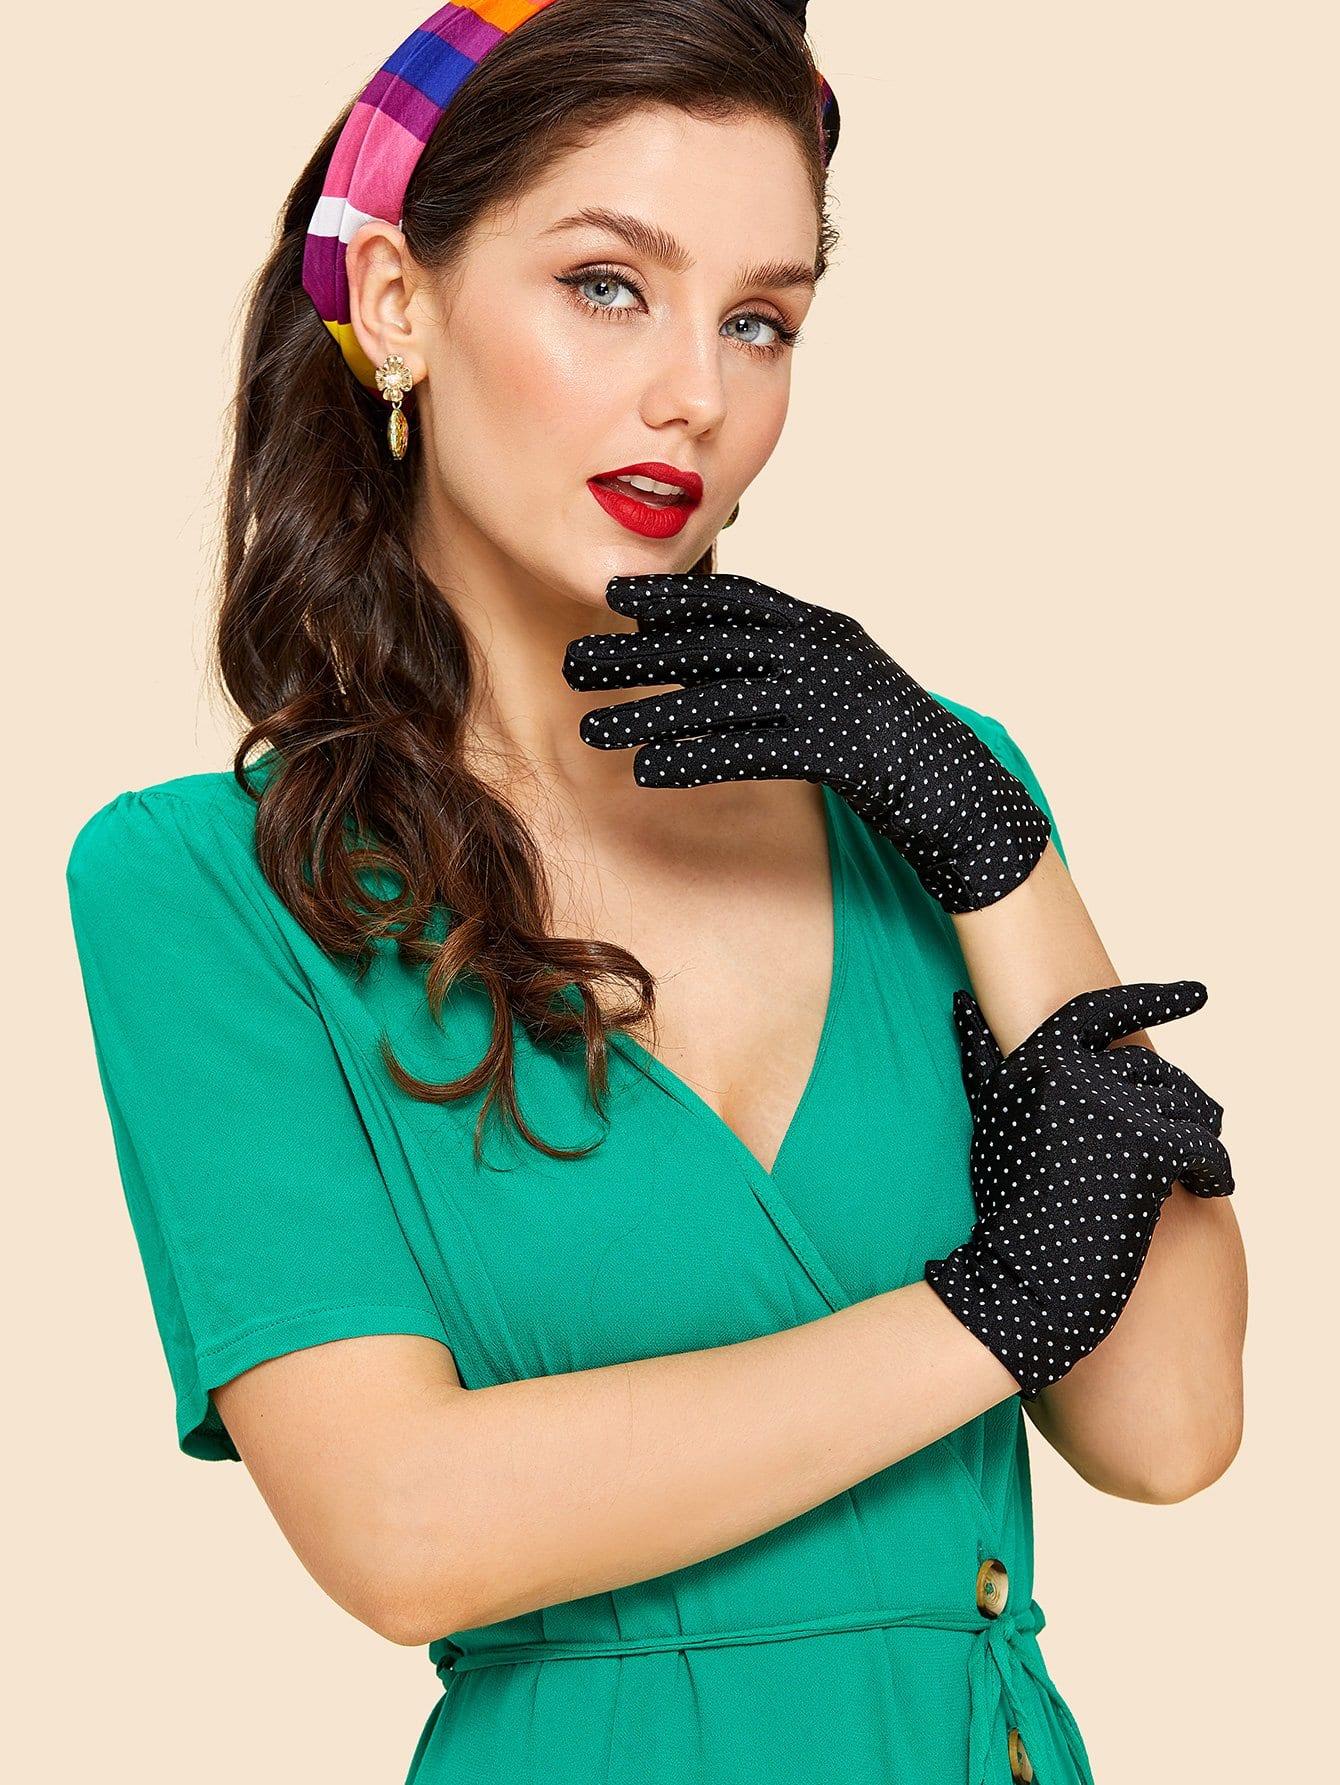 Polka Dot Gloves polka dot gloves